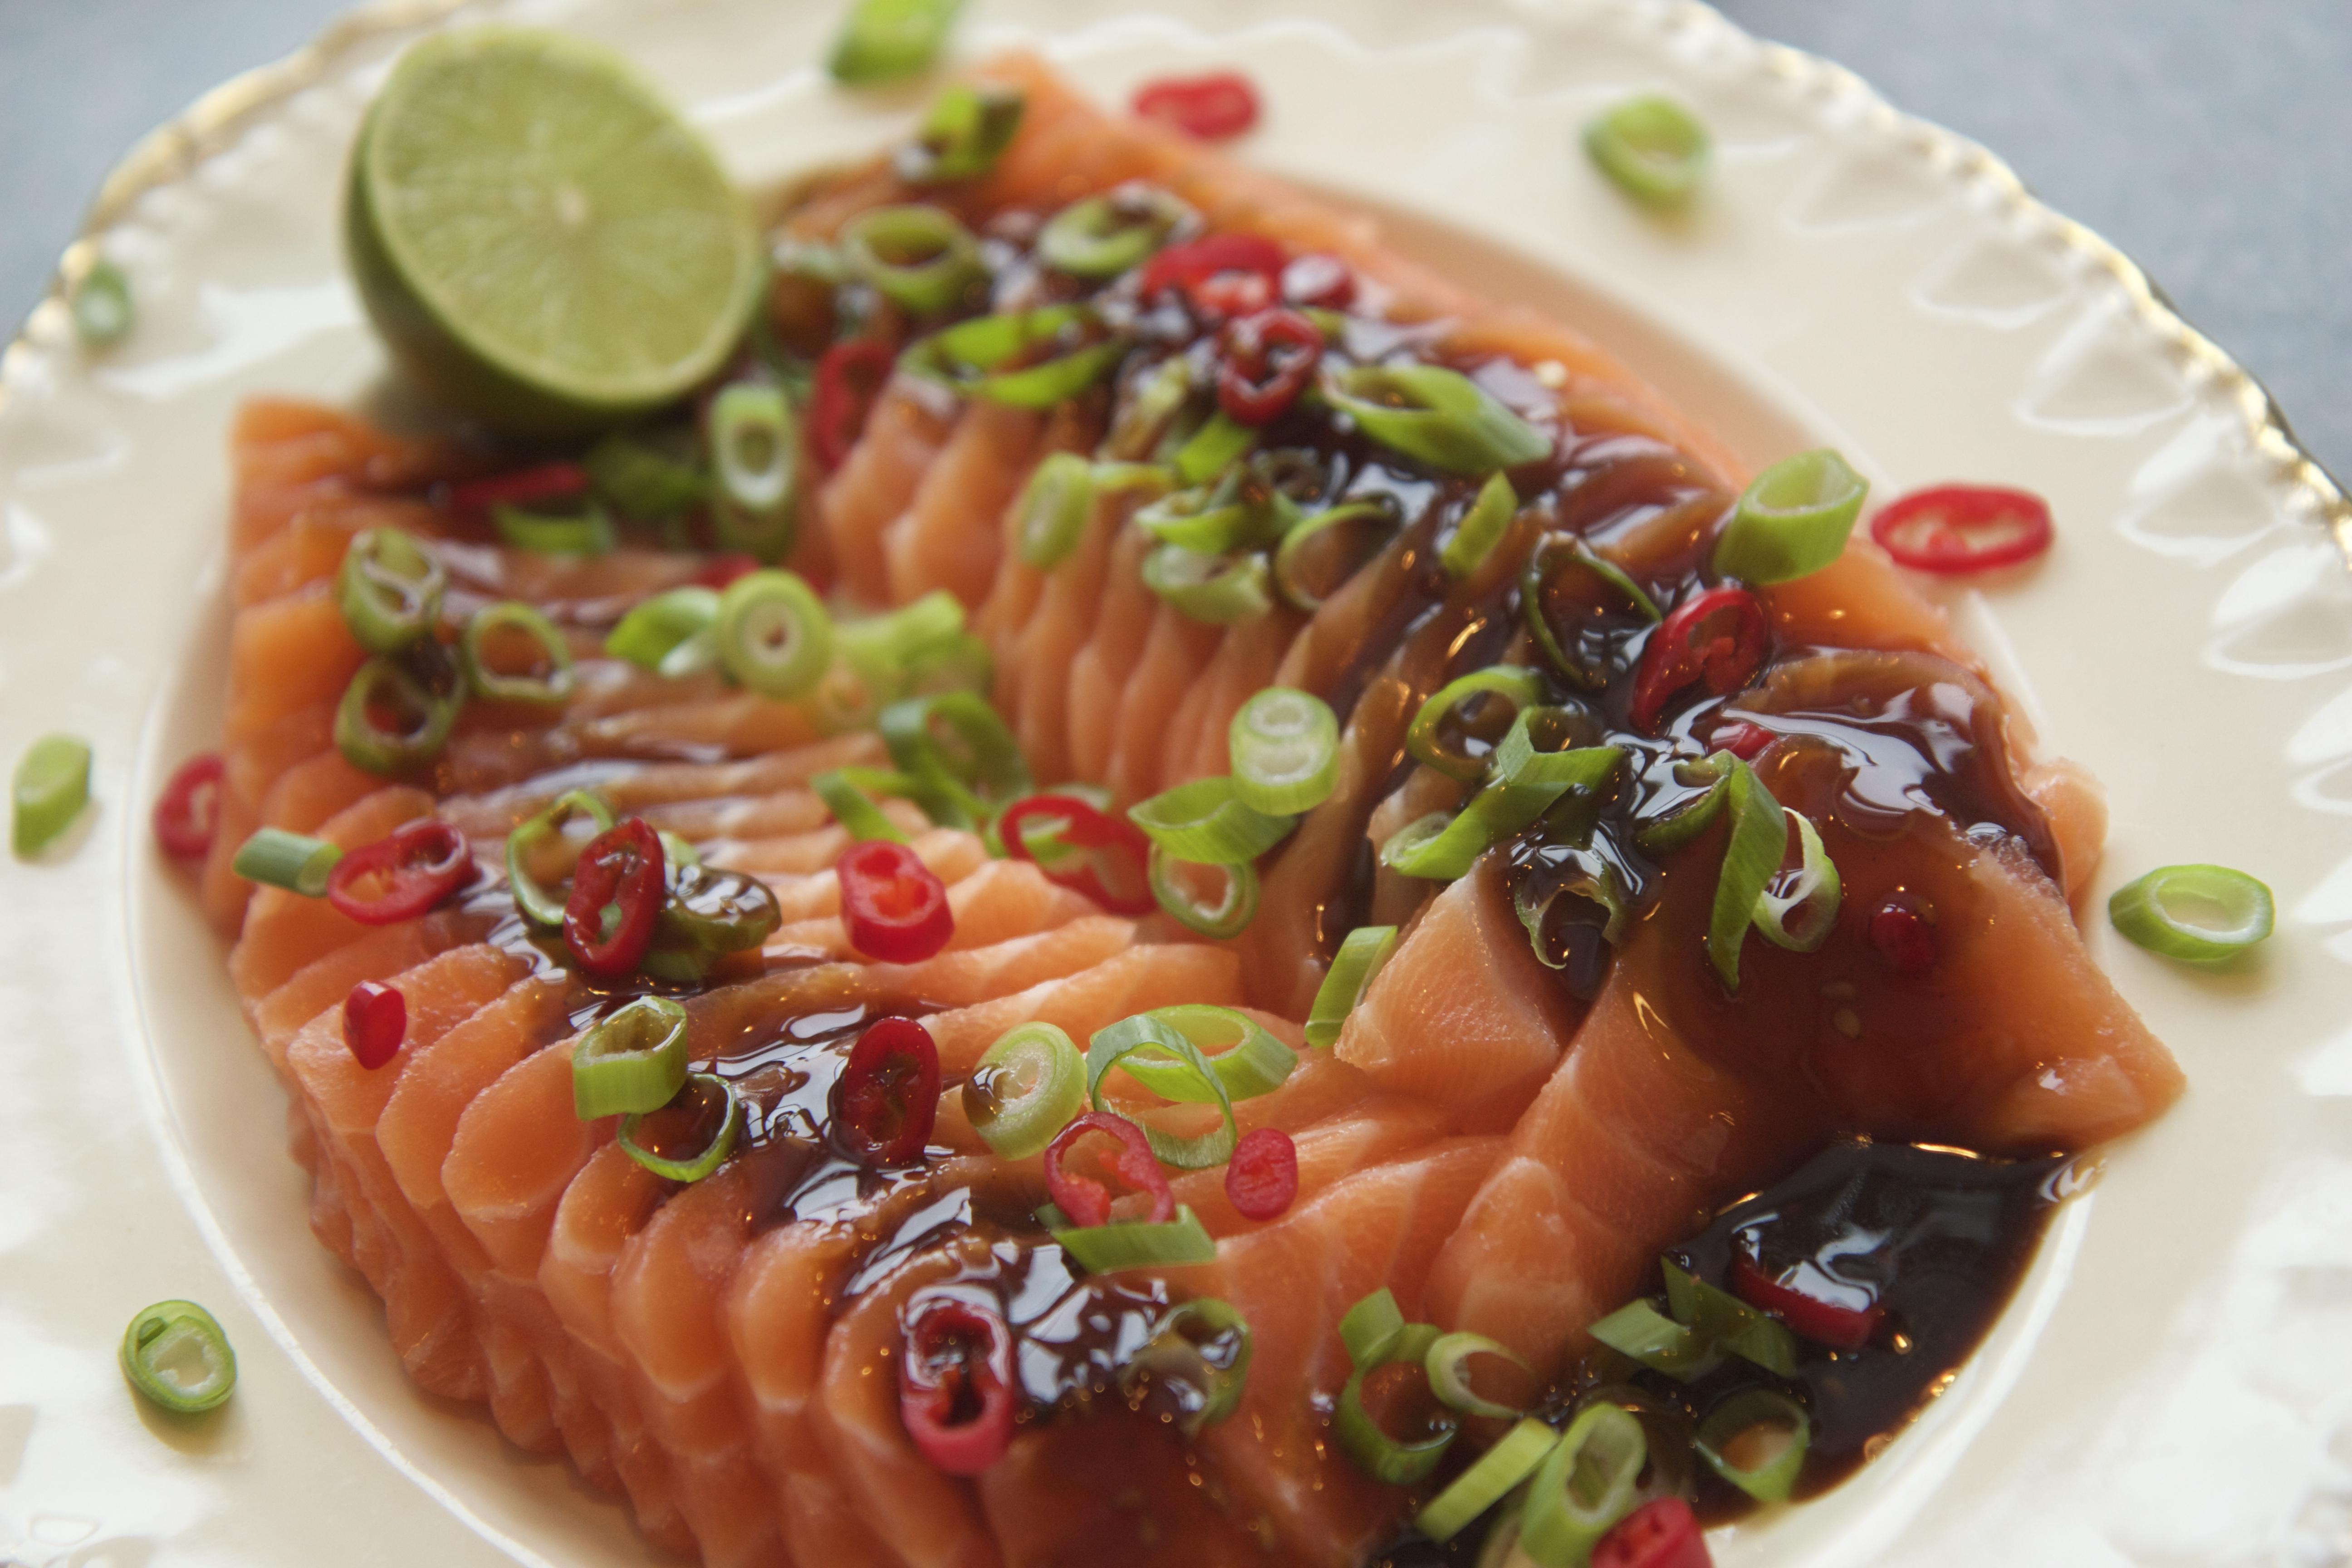 Sashimi med teriyaki dressing alt godt for Sashimi dressing